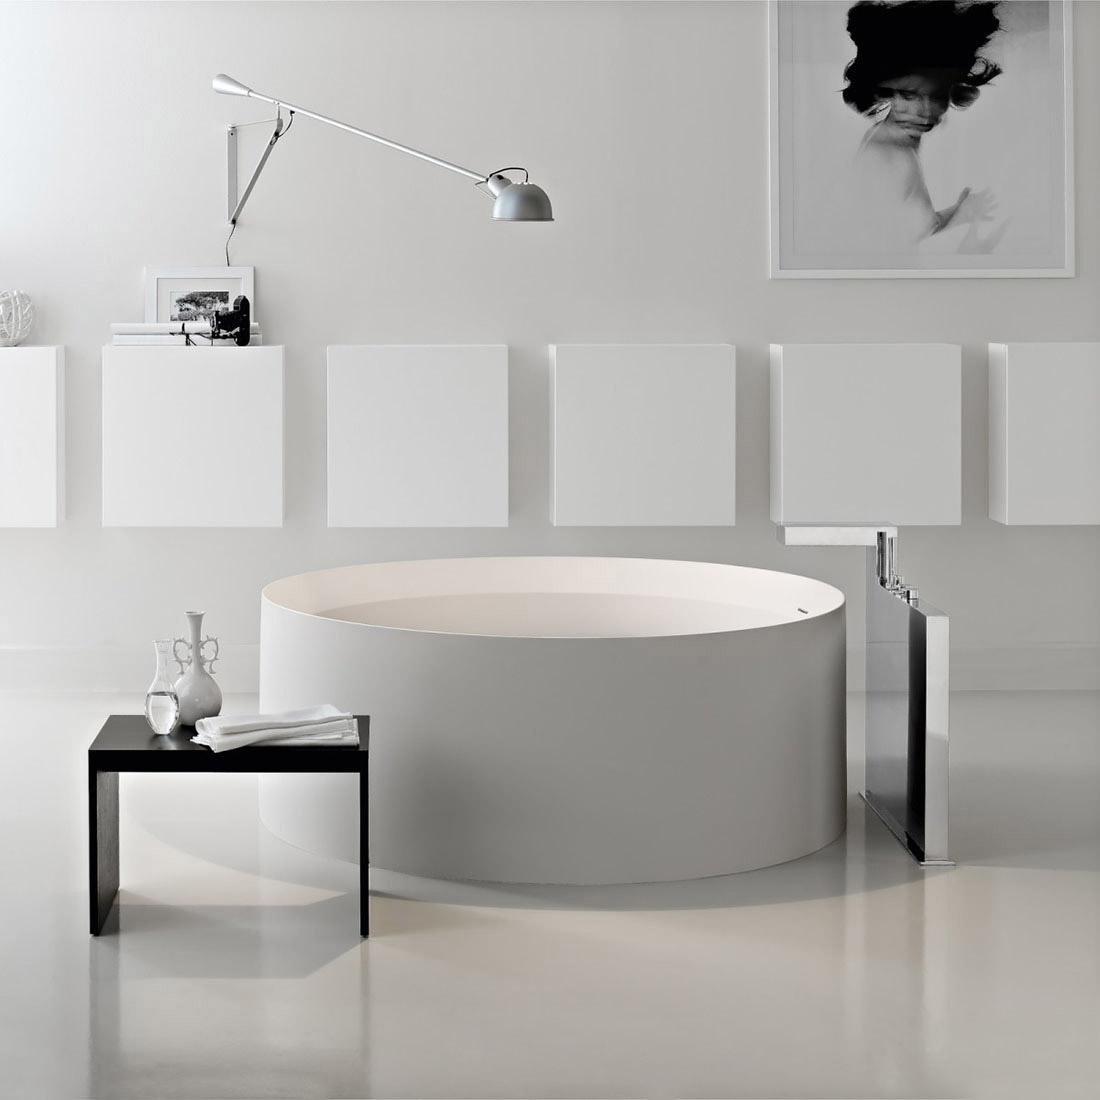 cea design vola thg waterworks dornbracht gessi agape laufen toscoquattro area kaldewei (41)